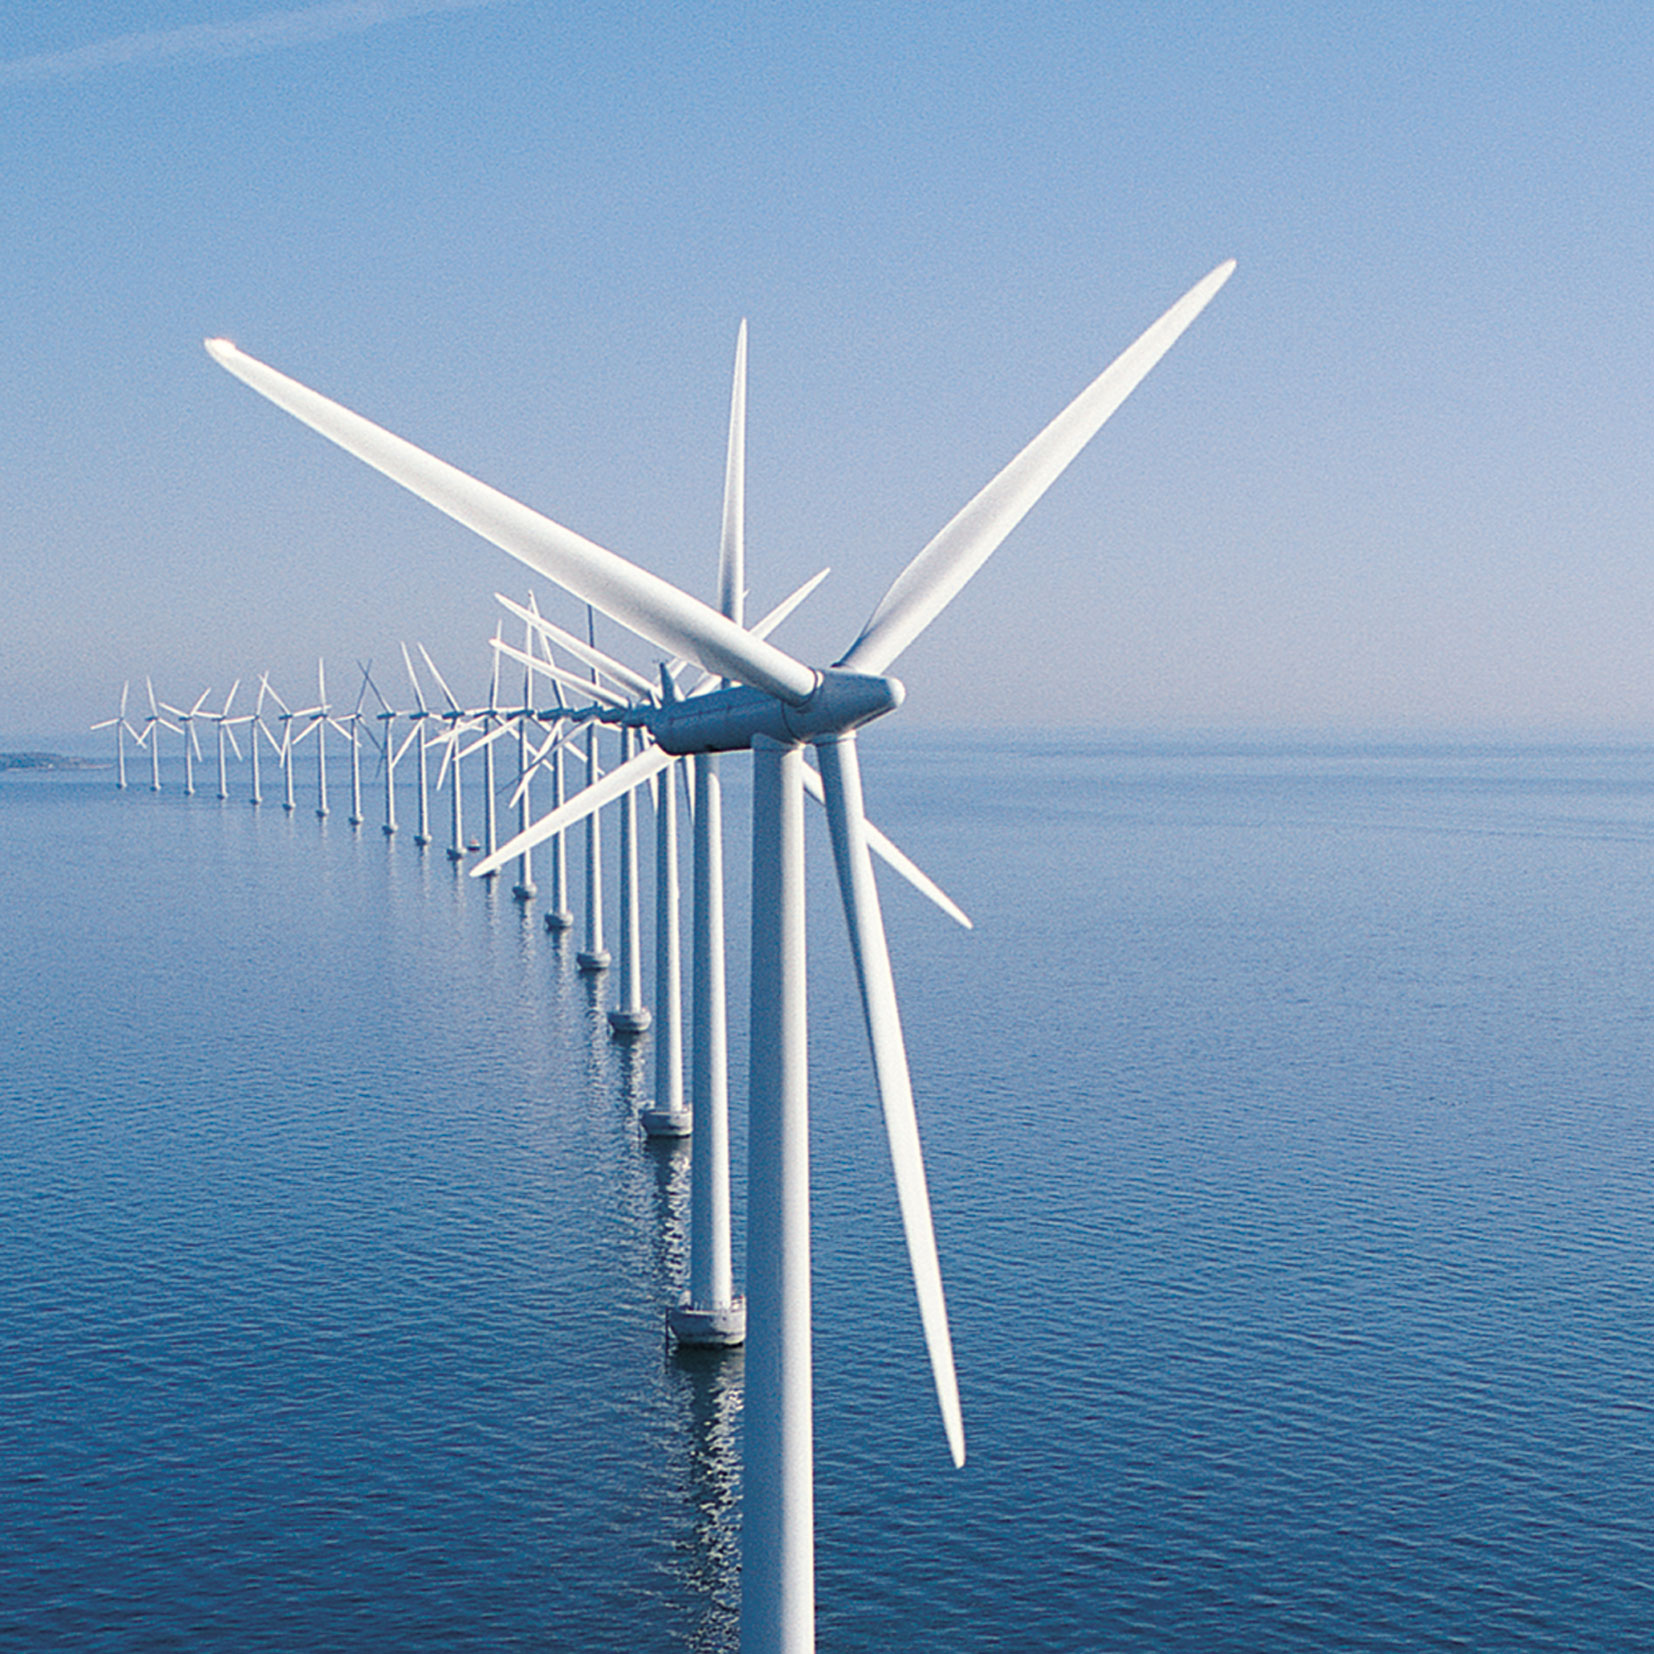 wind turbine on water